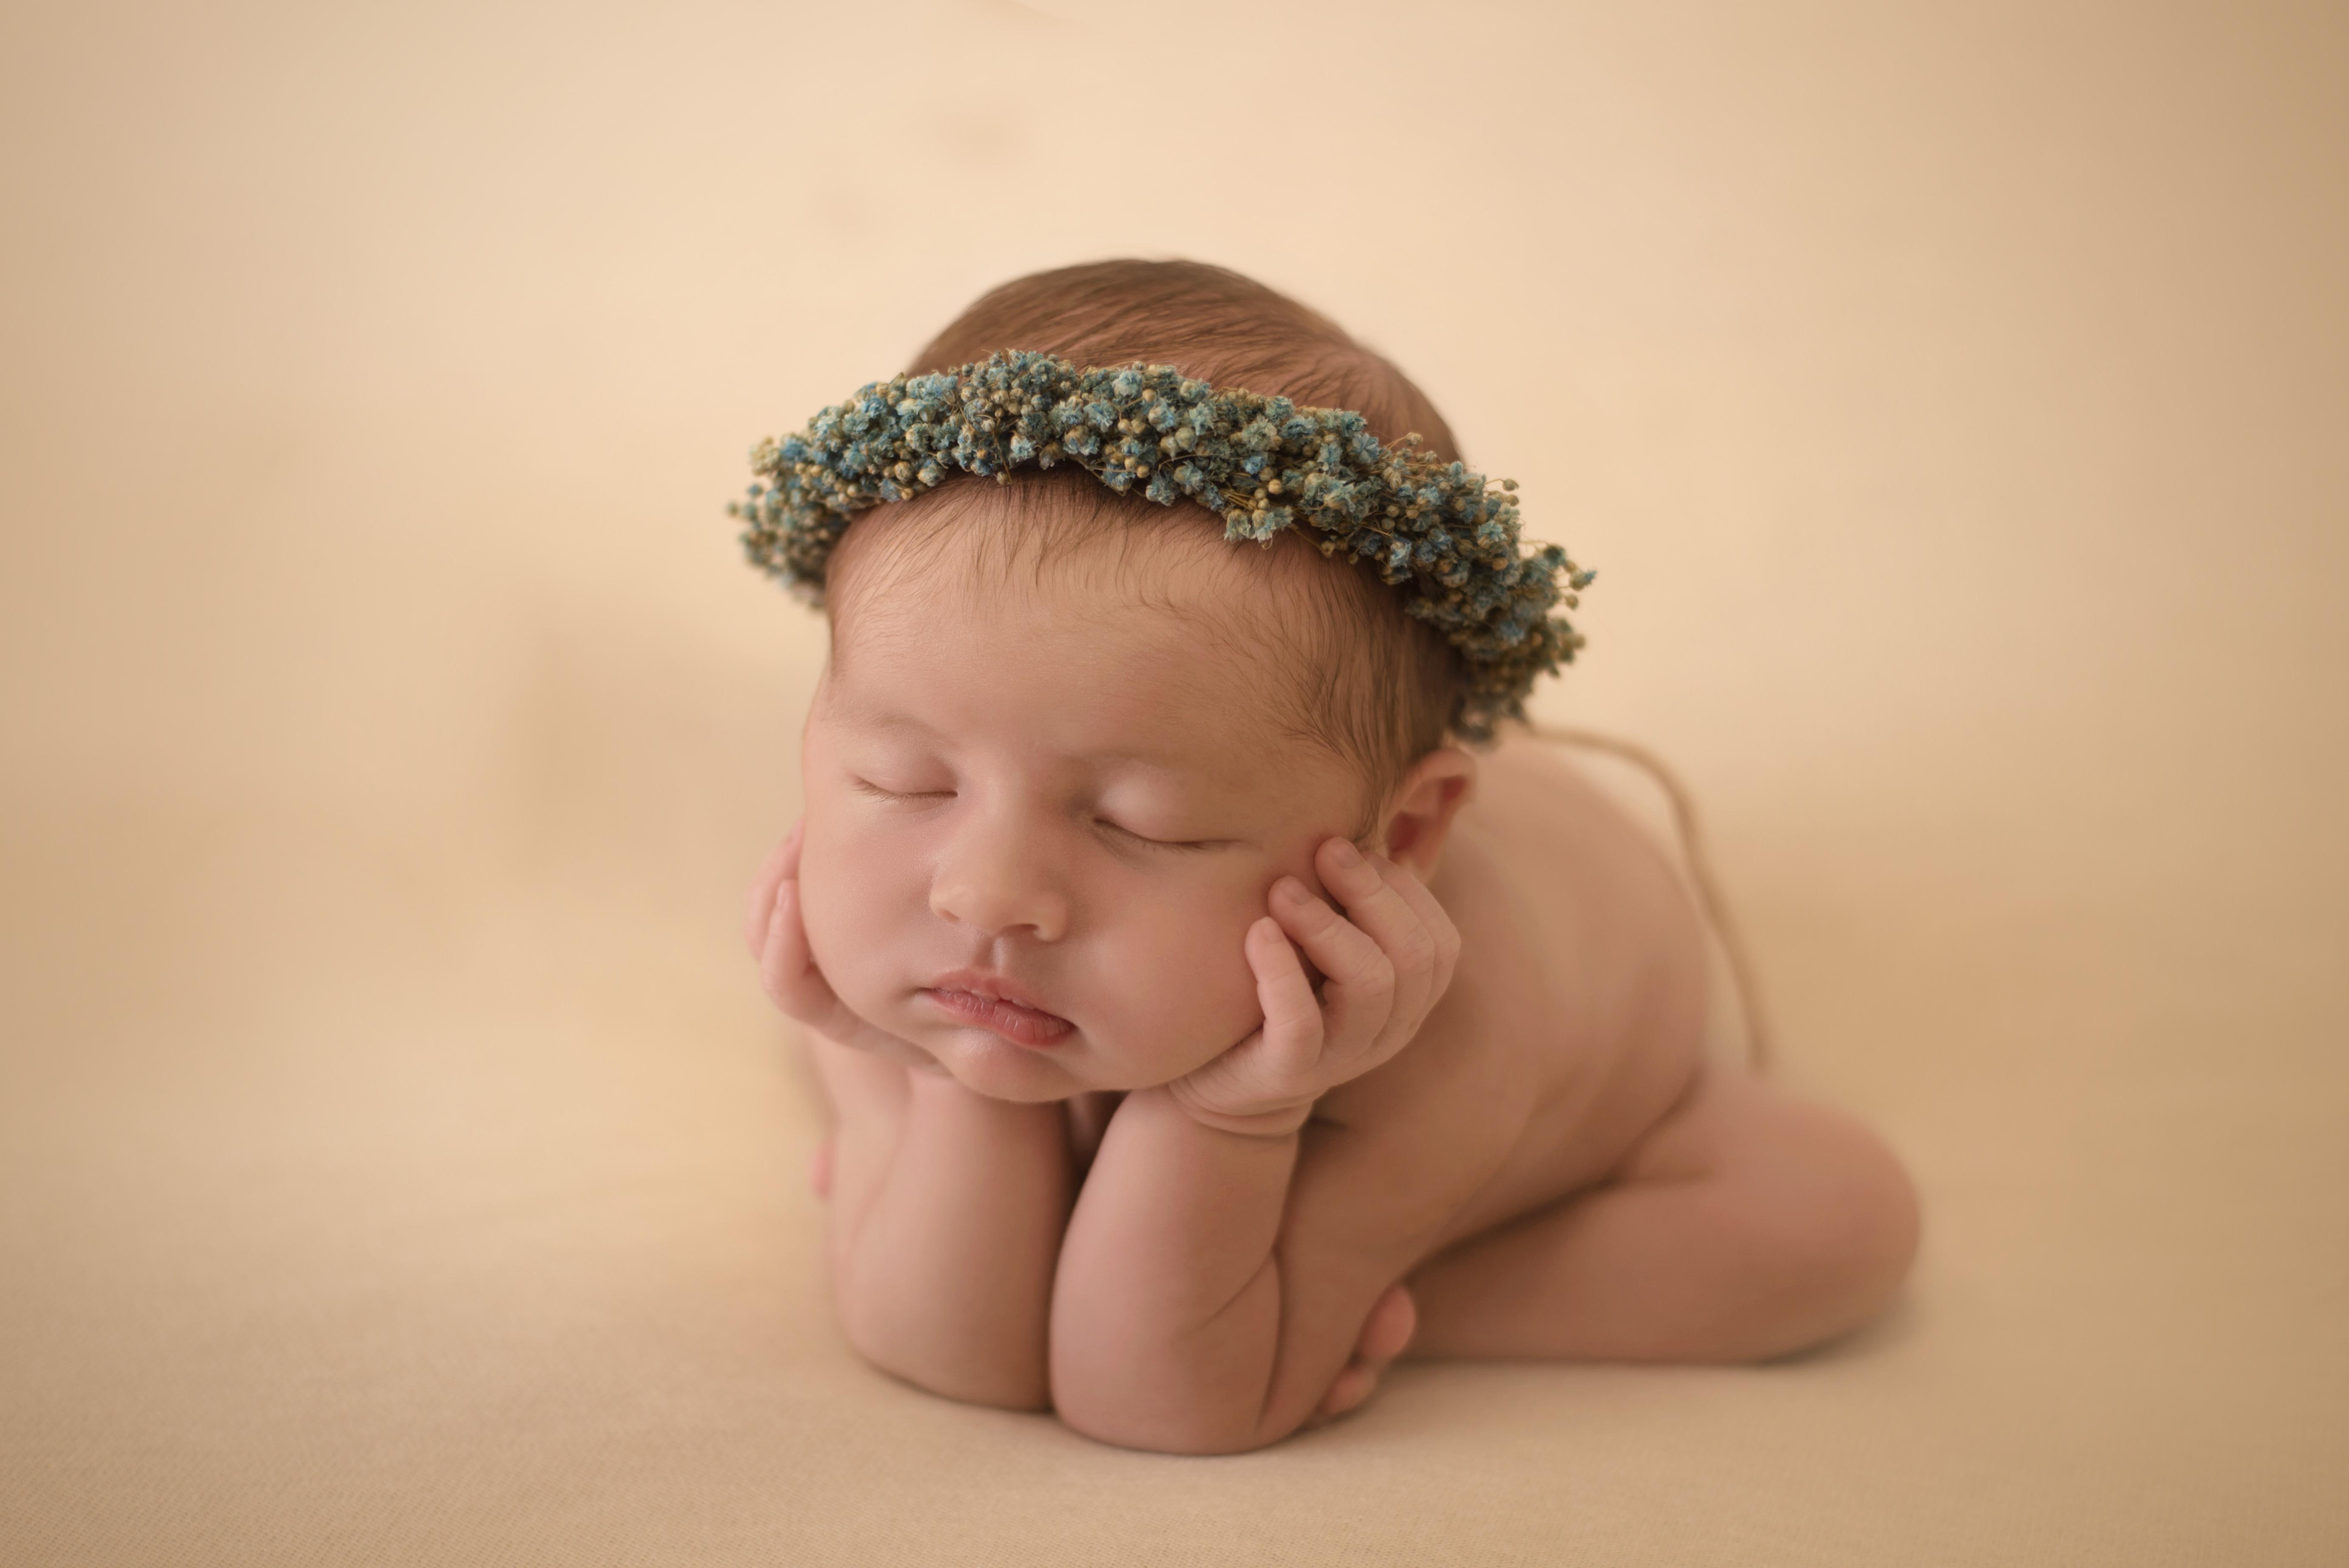 Pasitos_Newborn_Khloe_04